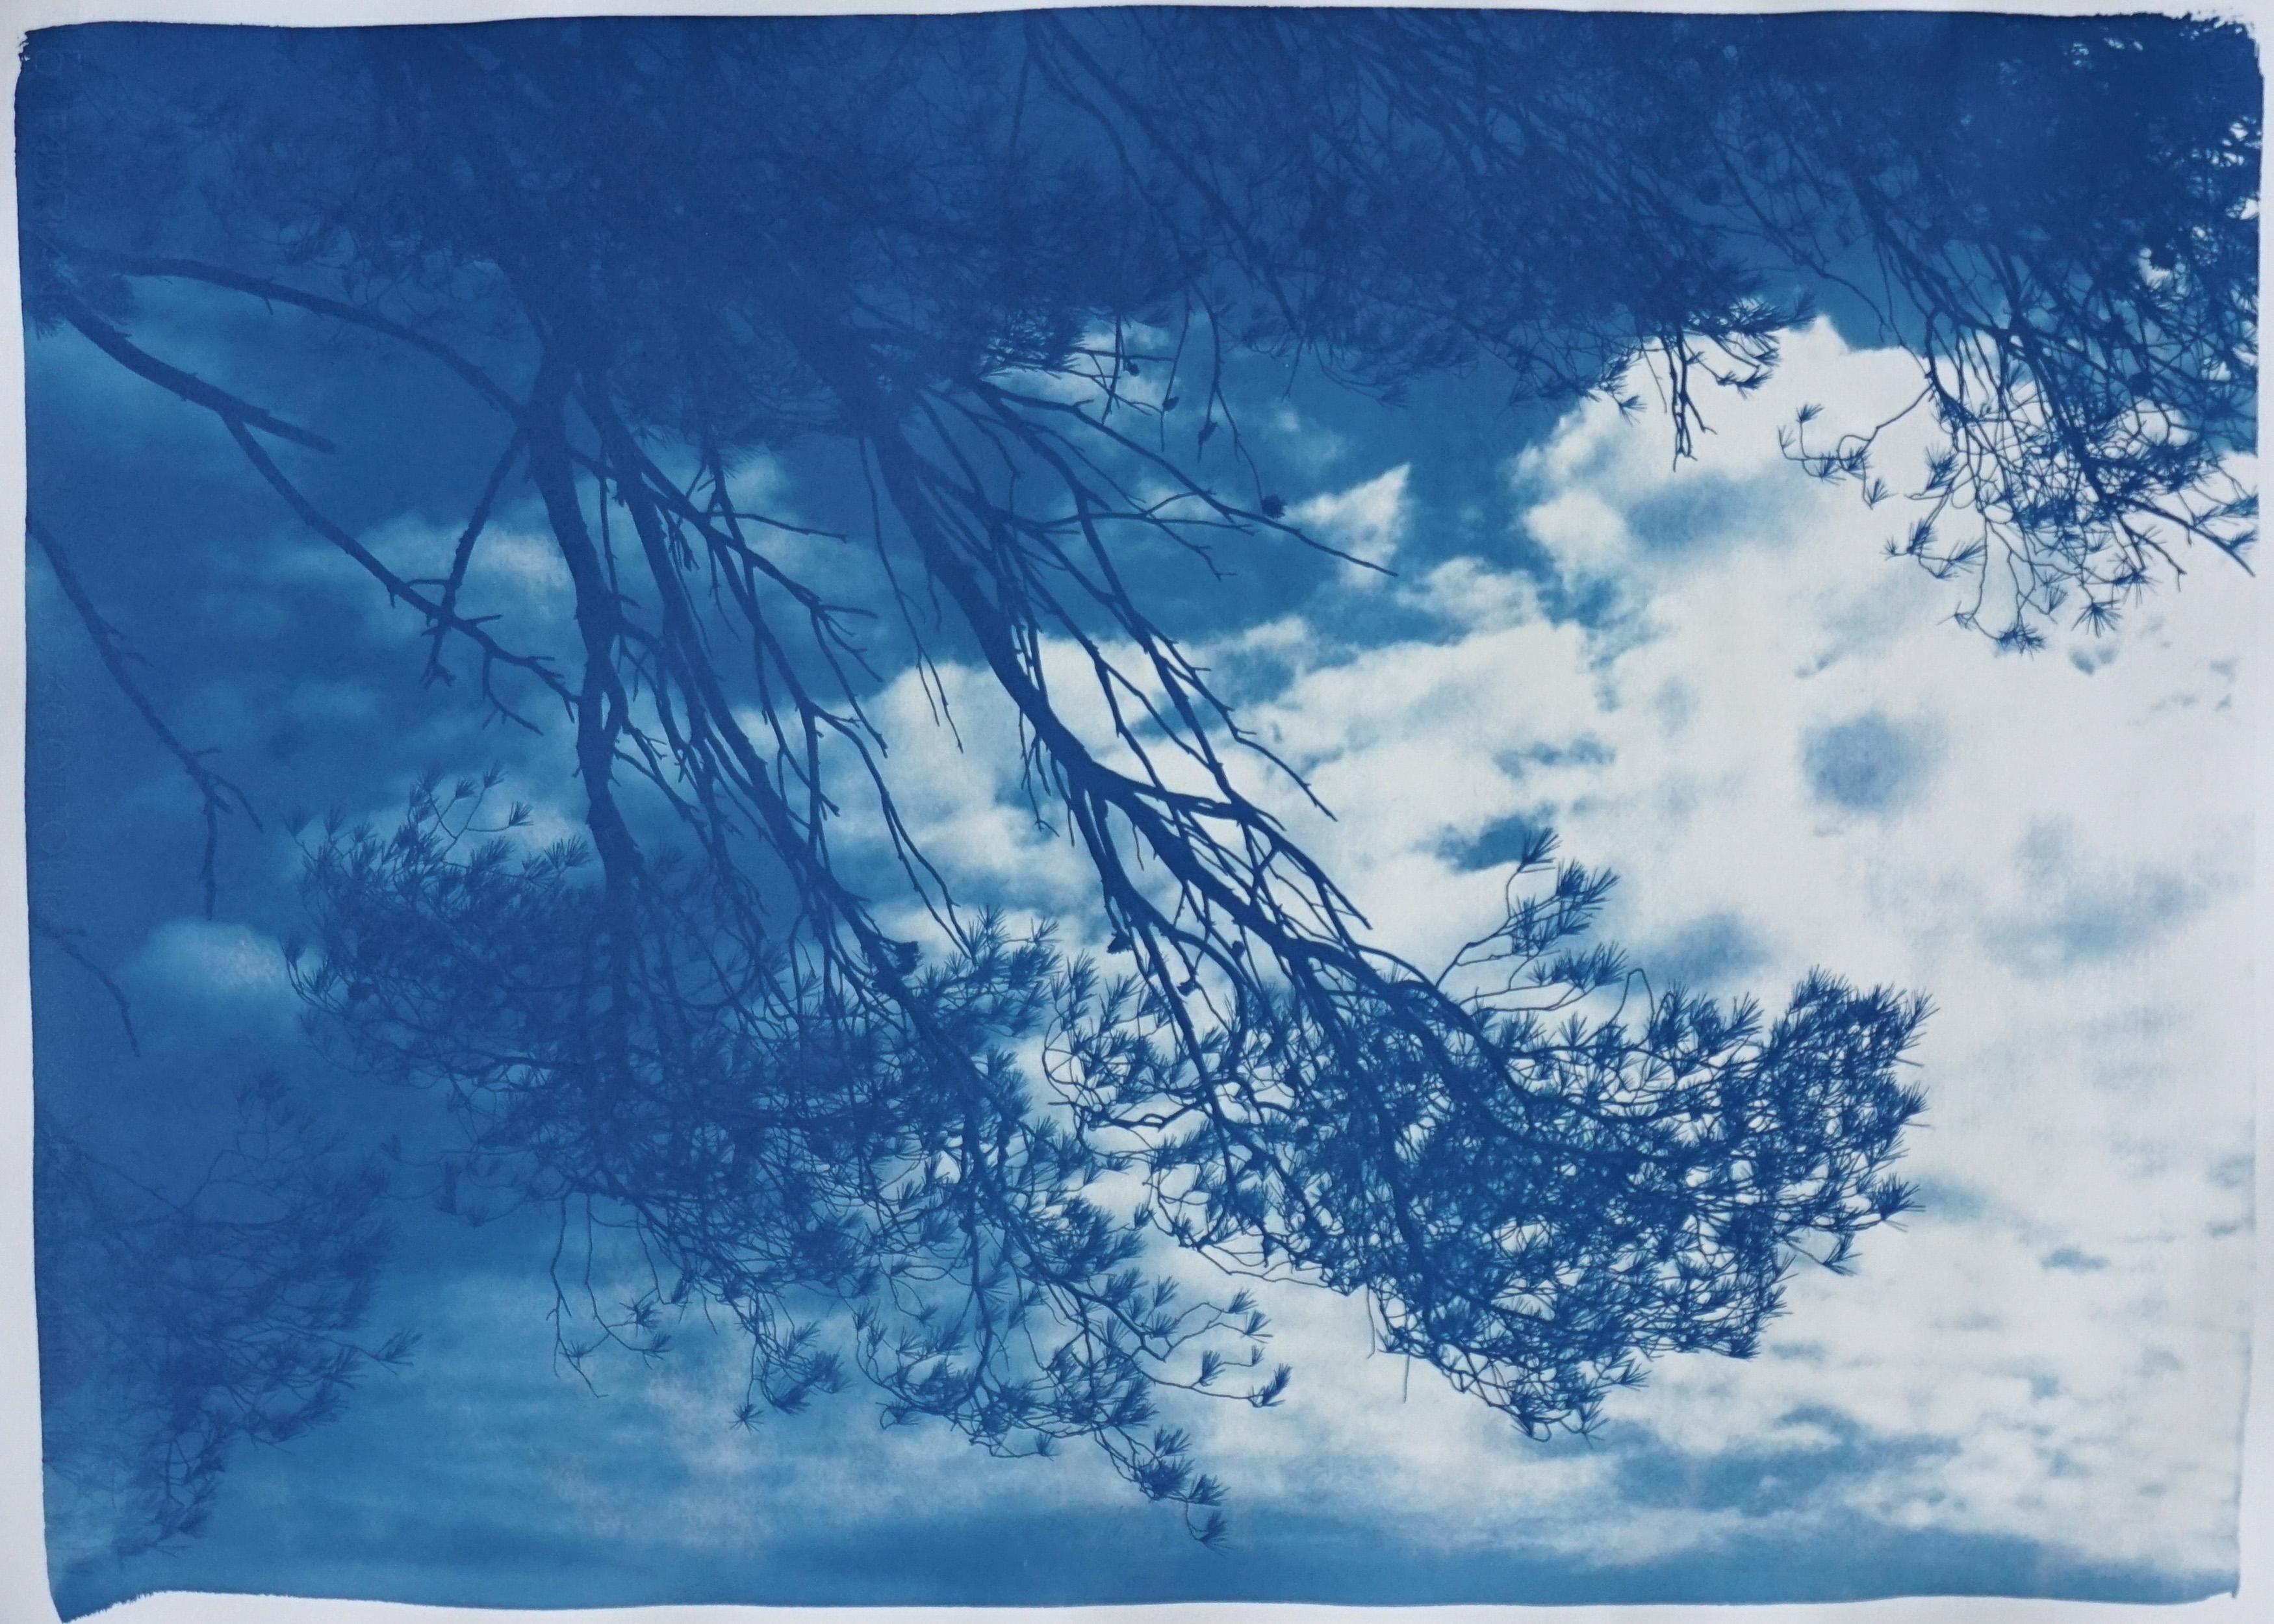 Malibu Pine Sea View, Limited Edition Cyanotype, California Landscape, Blueprint